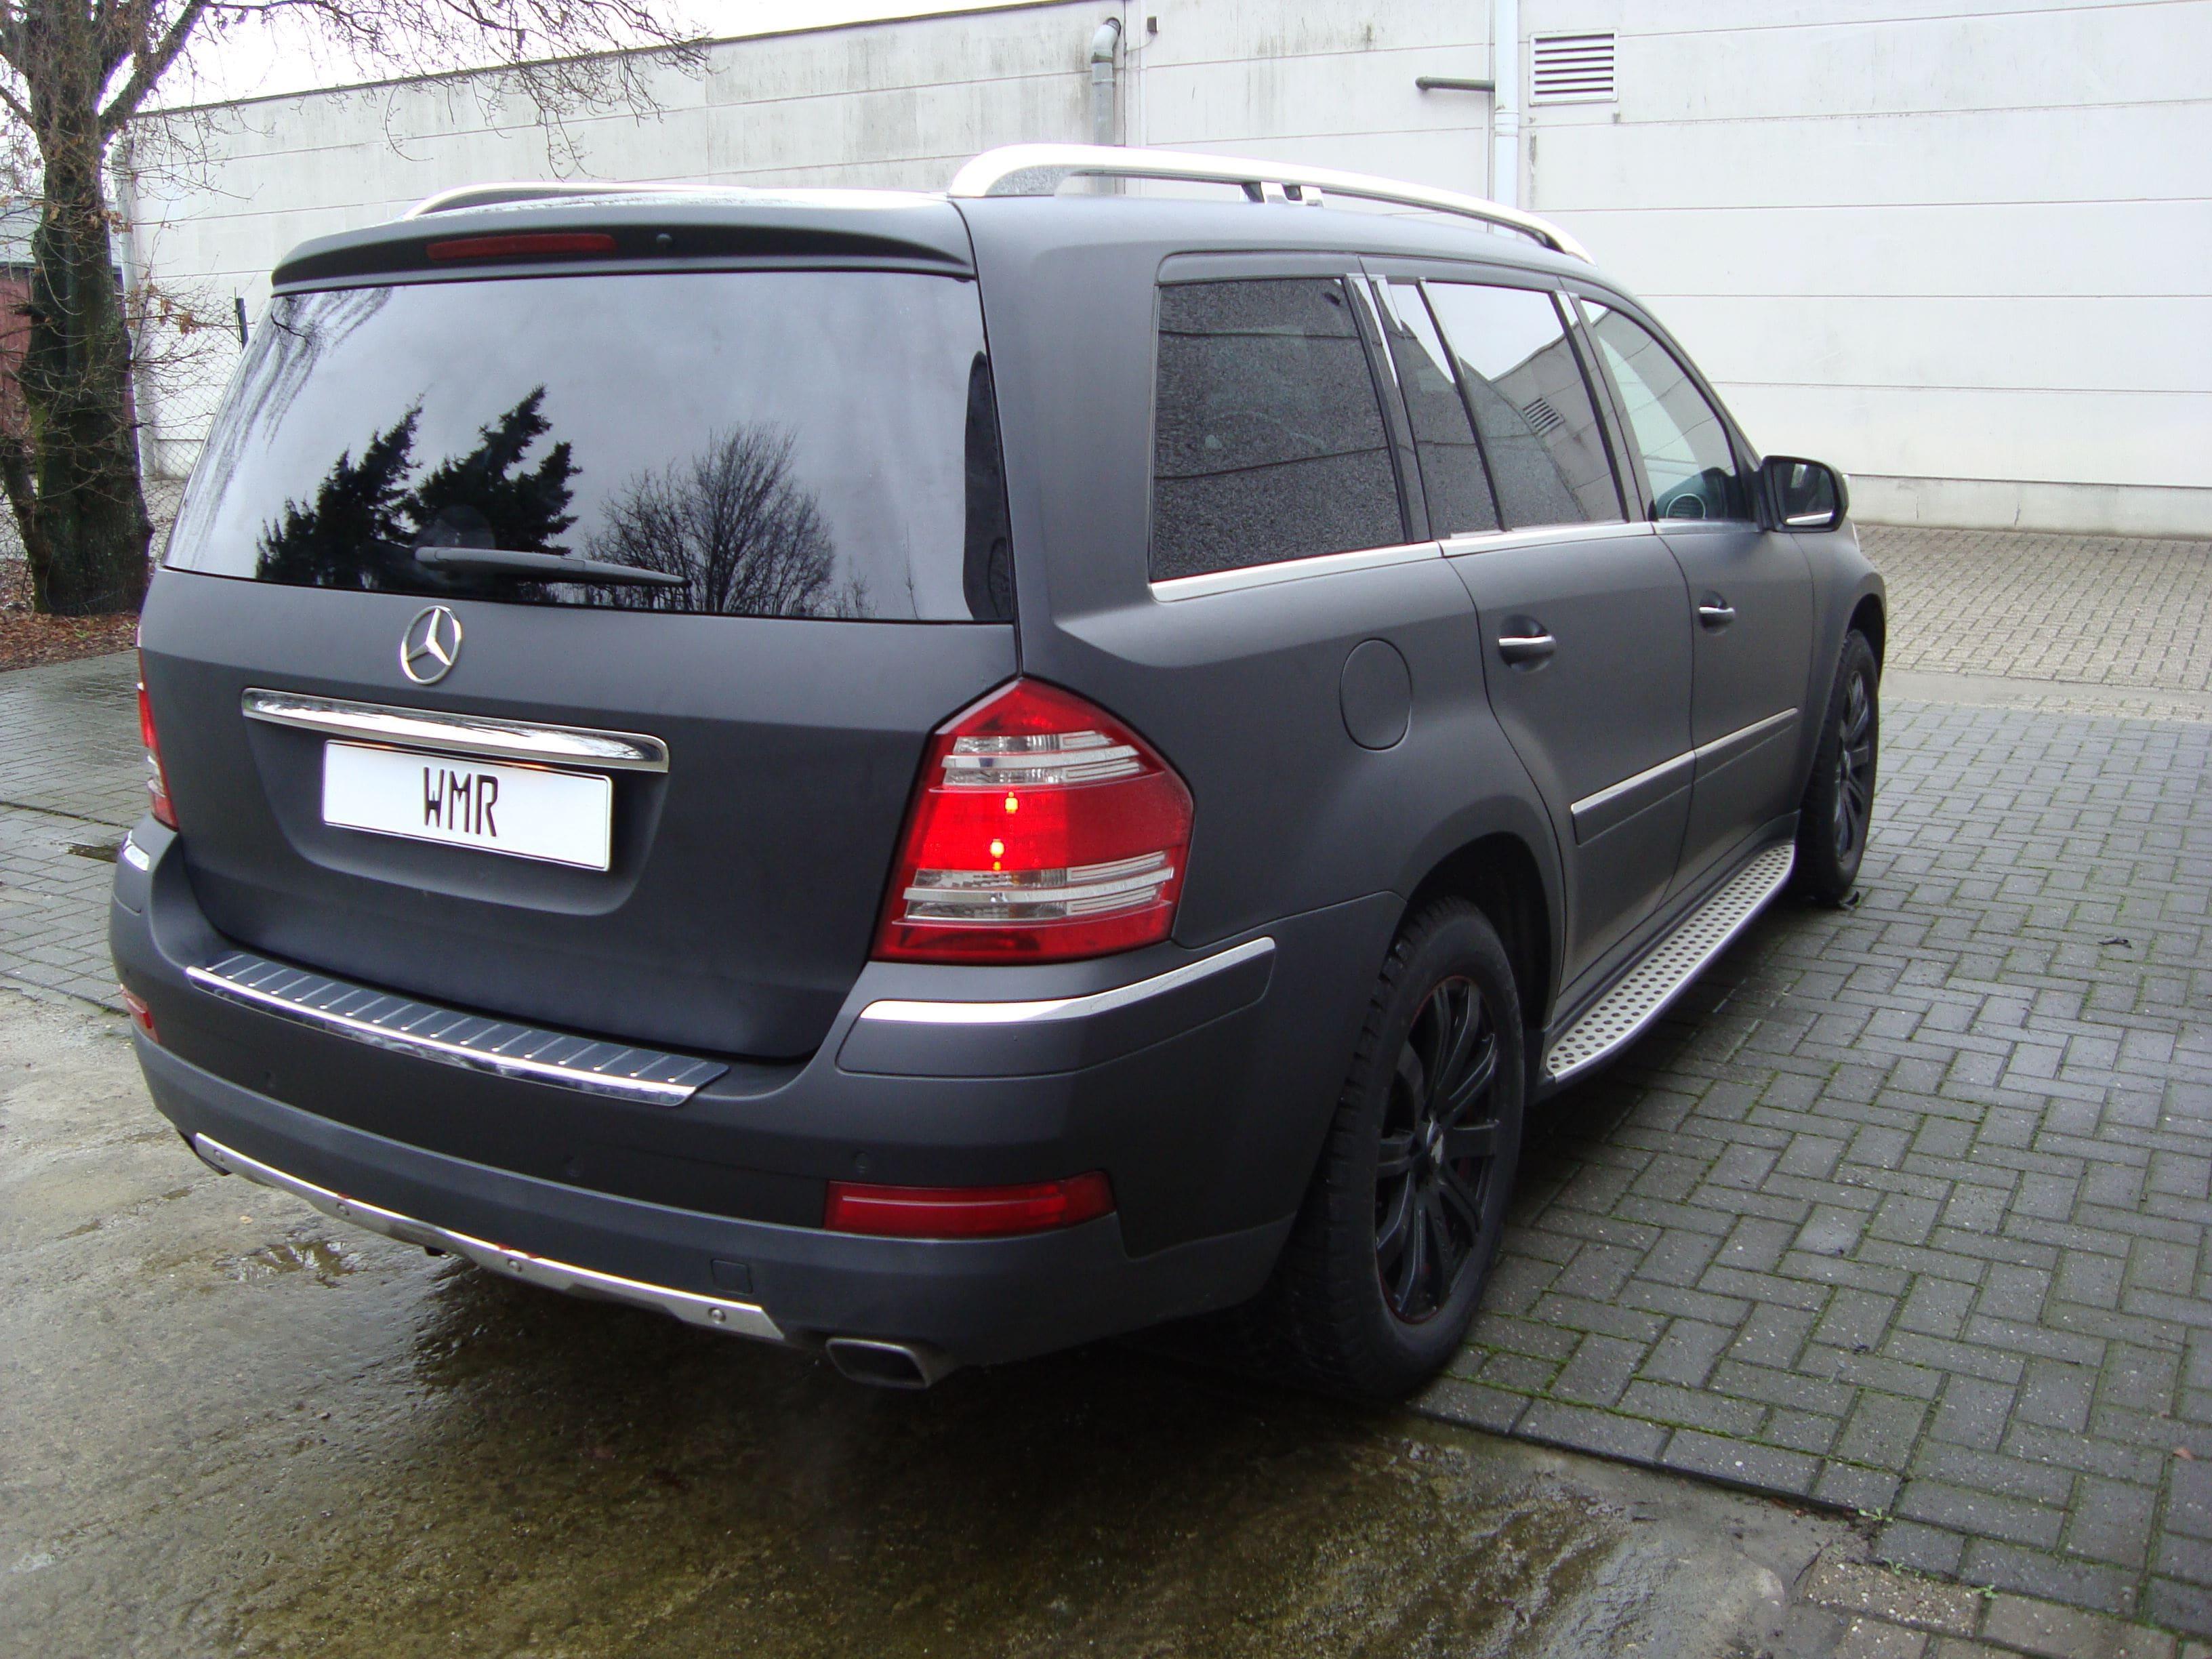 Mercedes GL met Mat Zwarte Wrap, Carwrapping door Wrapmyride.nu Foto-nr:6290, ©2020